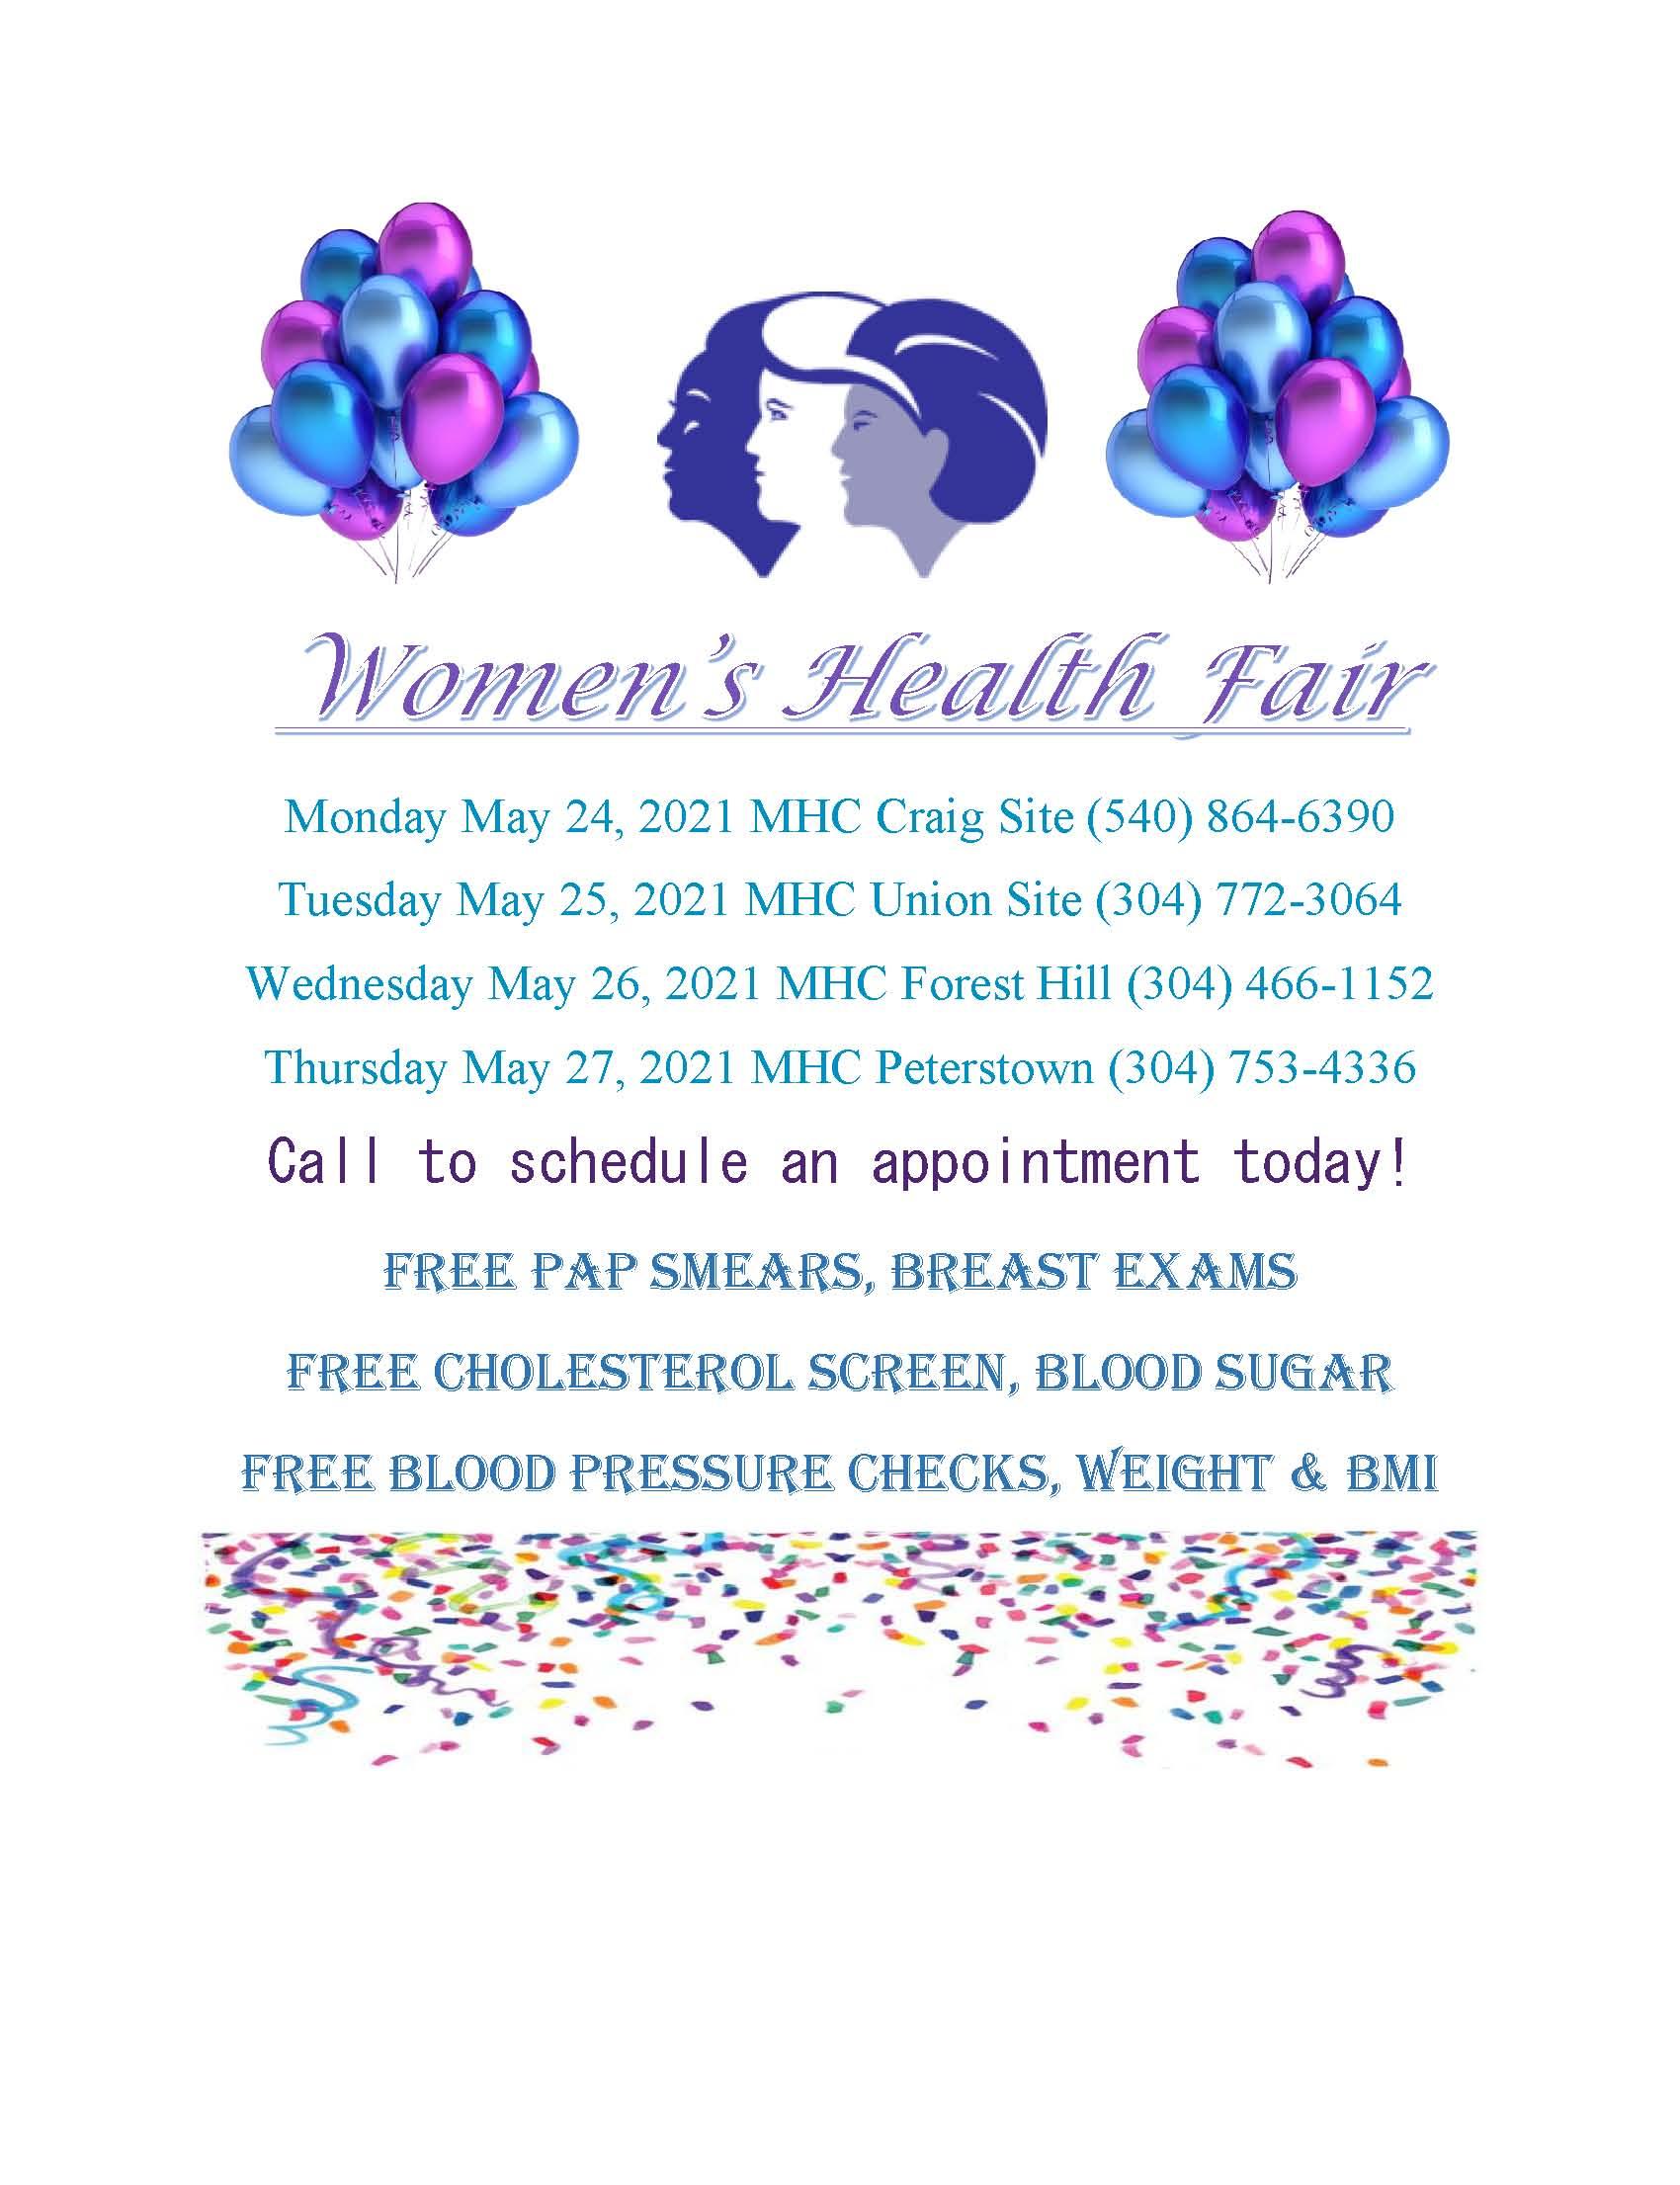 Women Health Fair Flyer - All sites